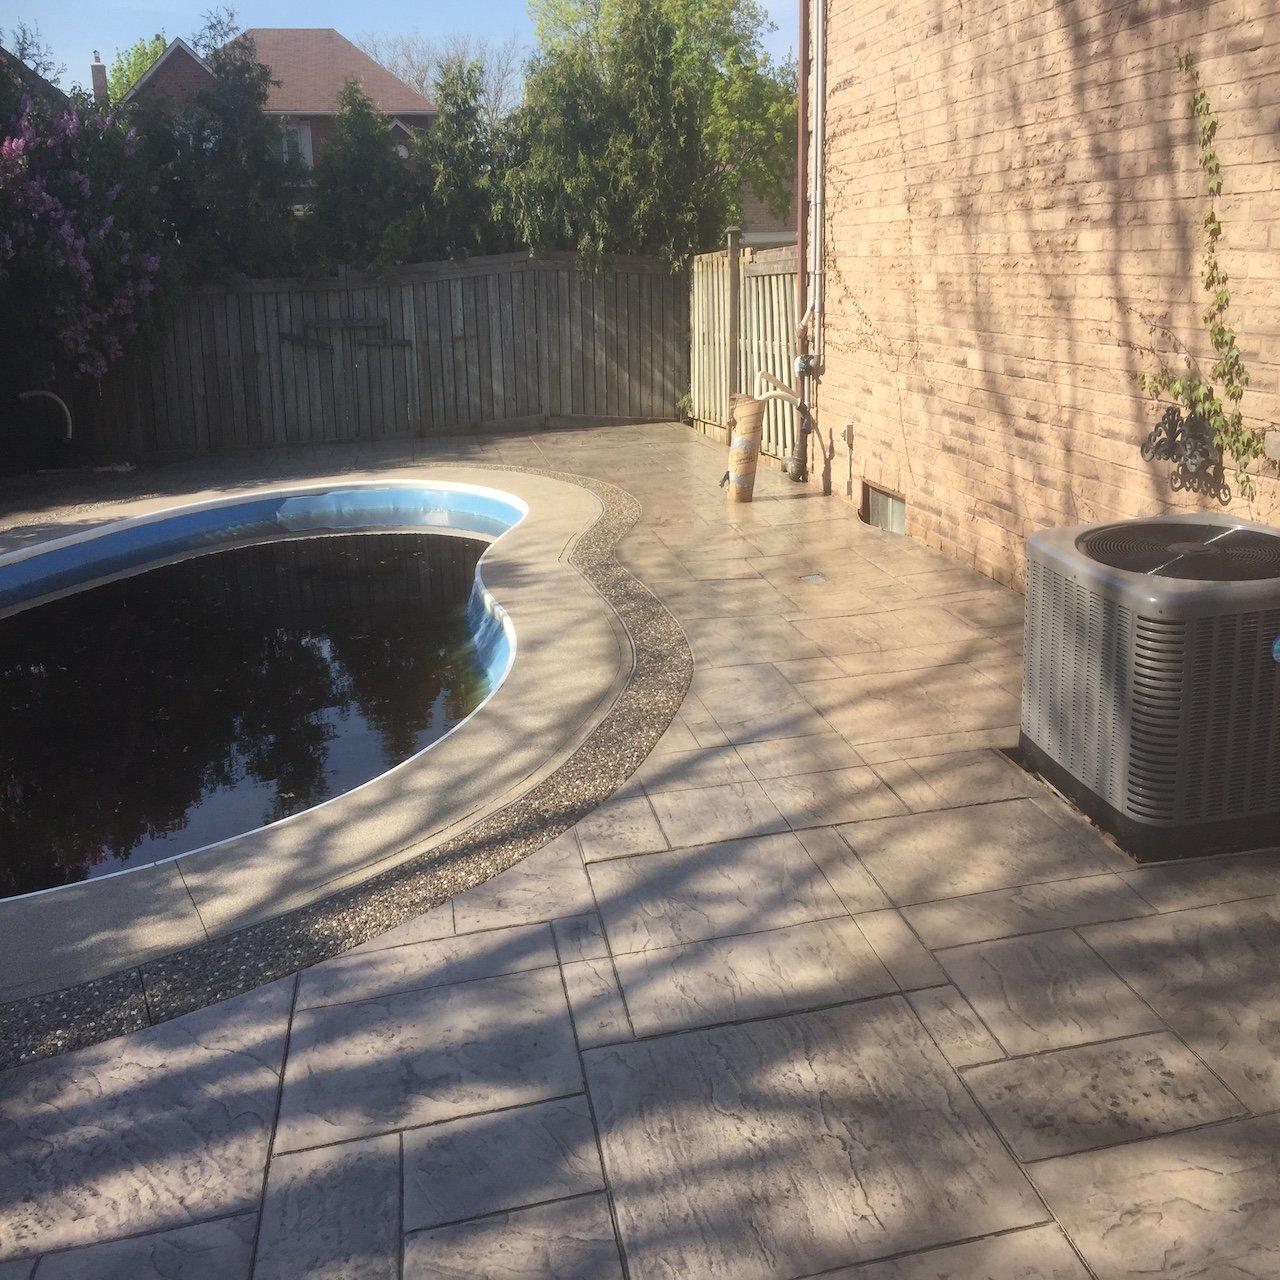 DecoMax Concrete - Concrete Pool Decks Gallery - 02